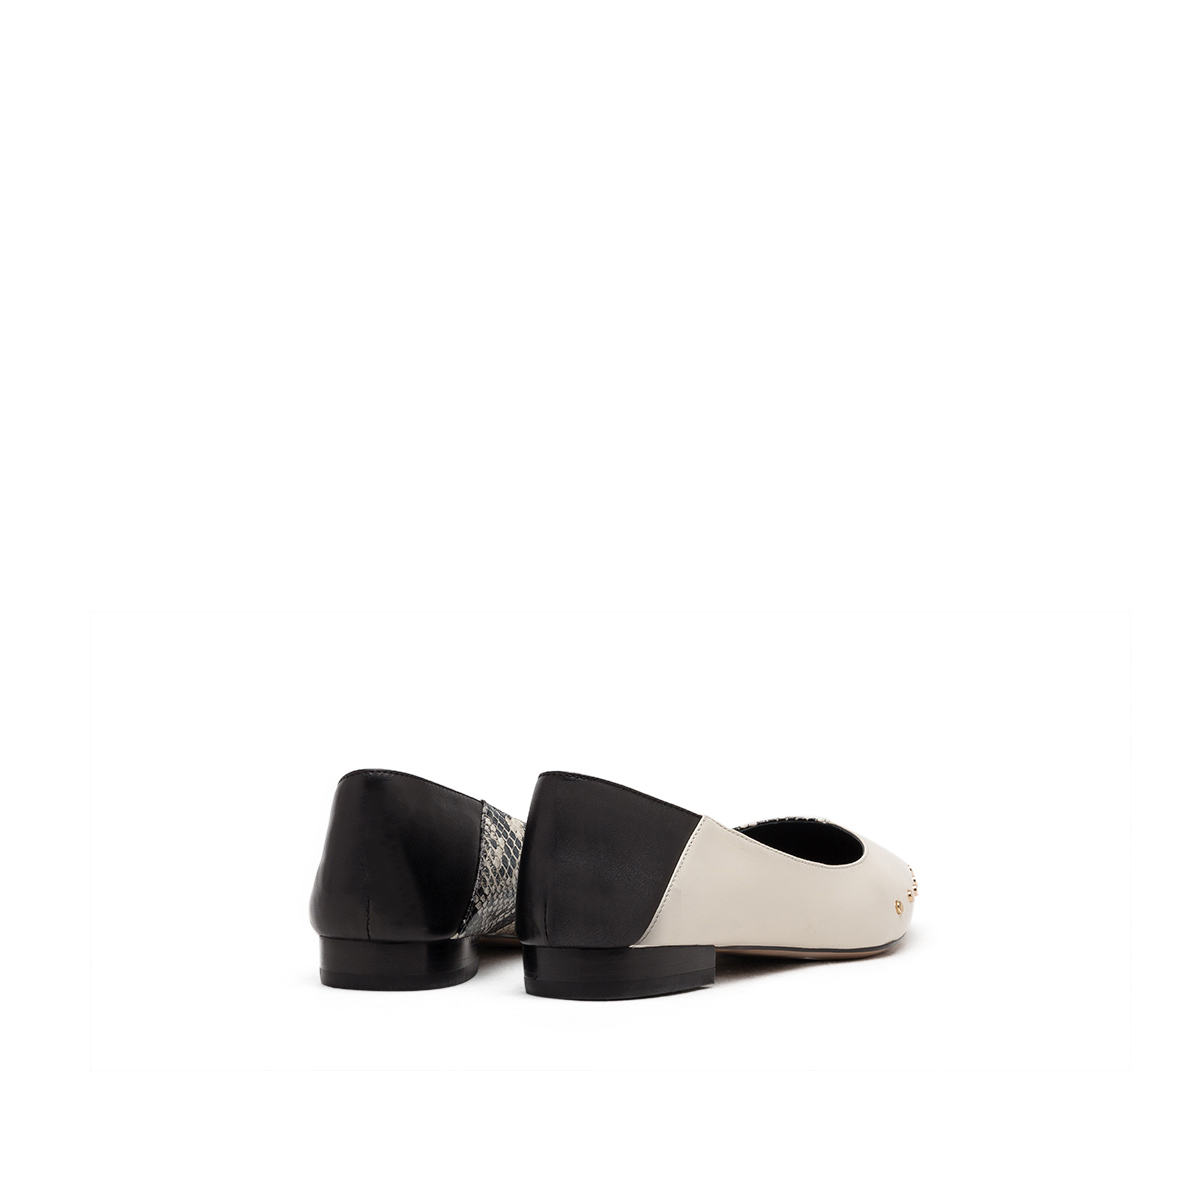 SS01111103 春季新款欧美浅口低平跟铆钉单鞋女 2020 星期六 Sat & St